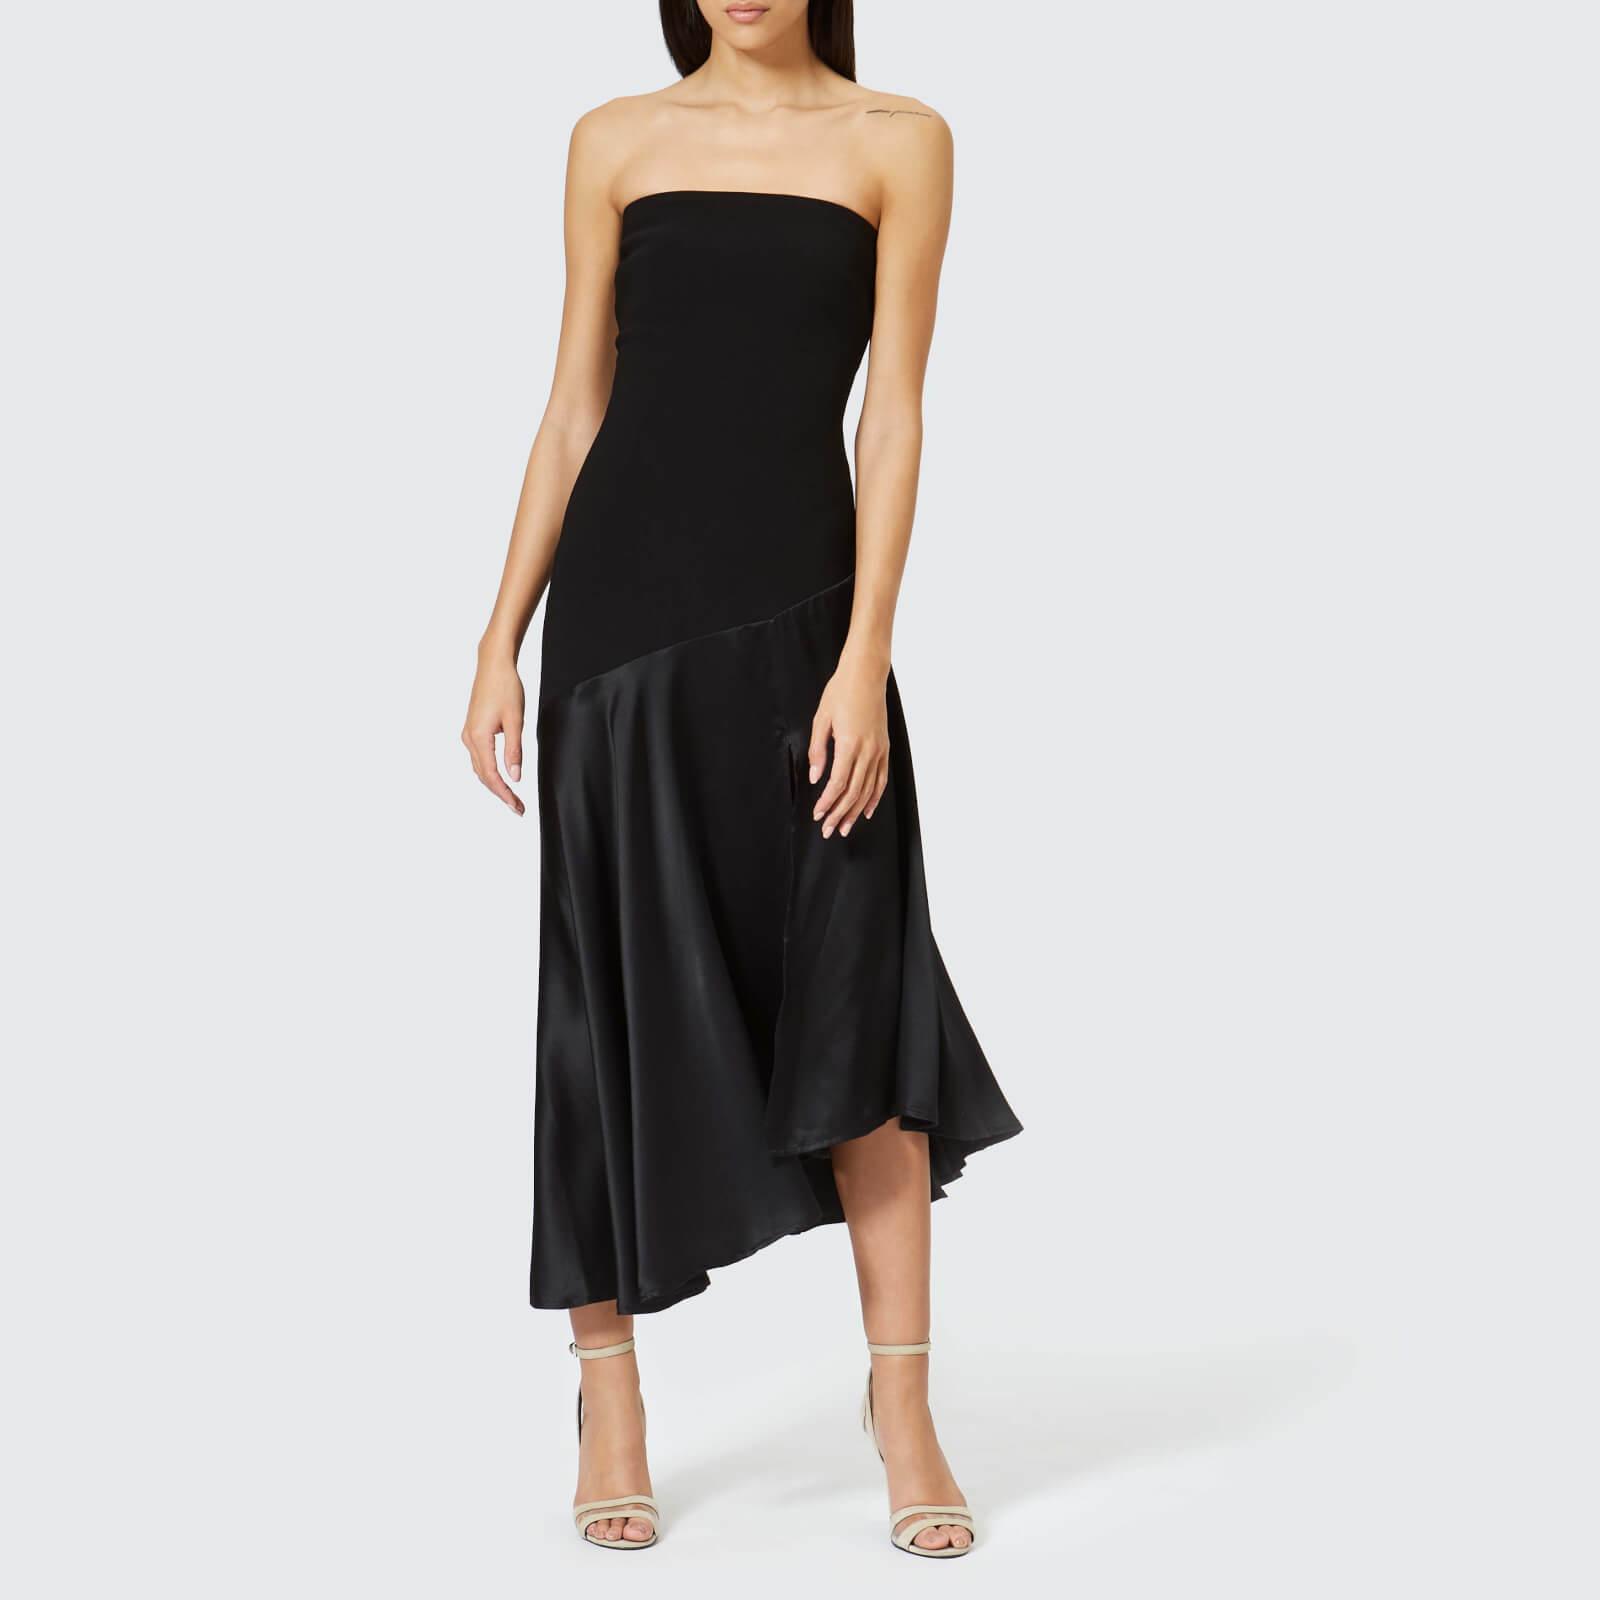 Bec & Bridge Women's Natalia Strapless Dress - Black - UK 12 - Black